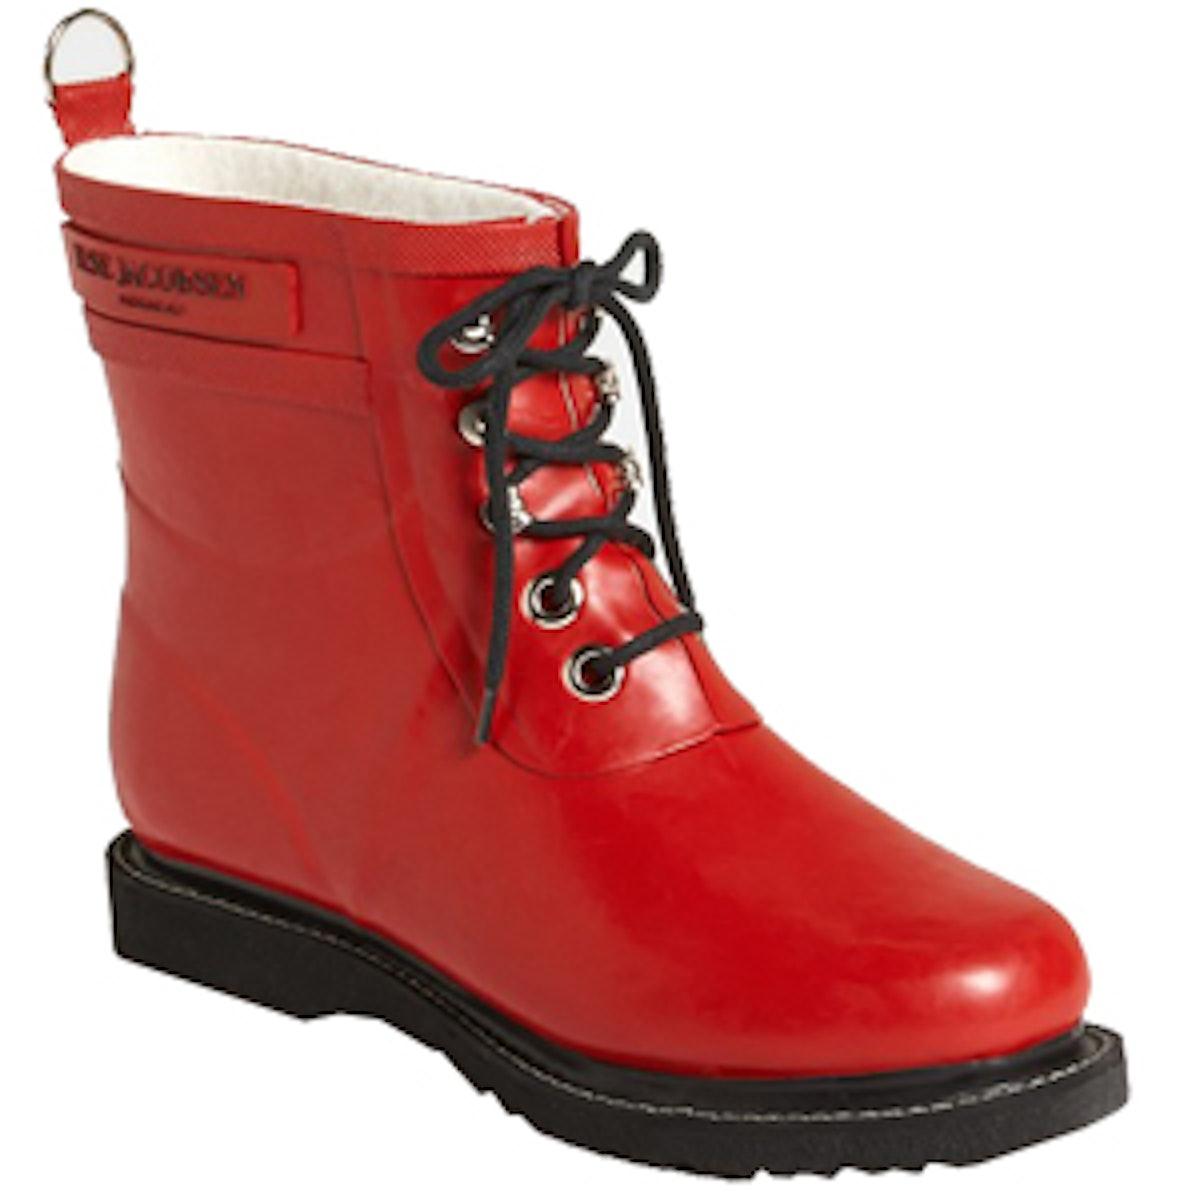 Hornbaek Rub Boot